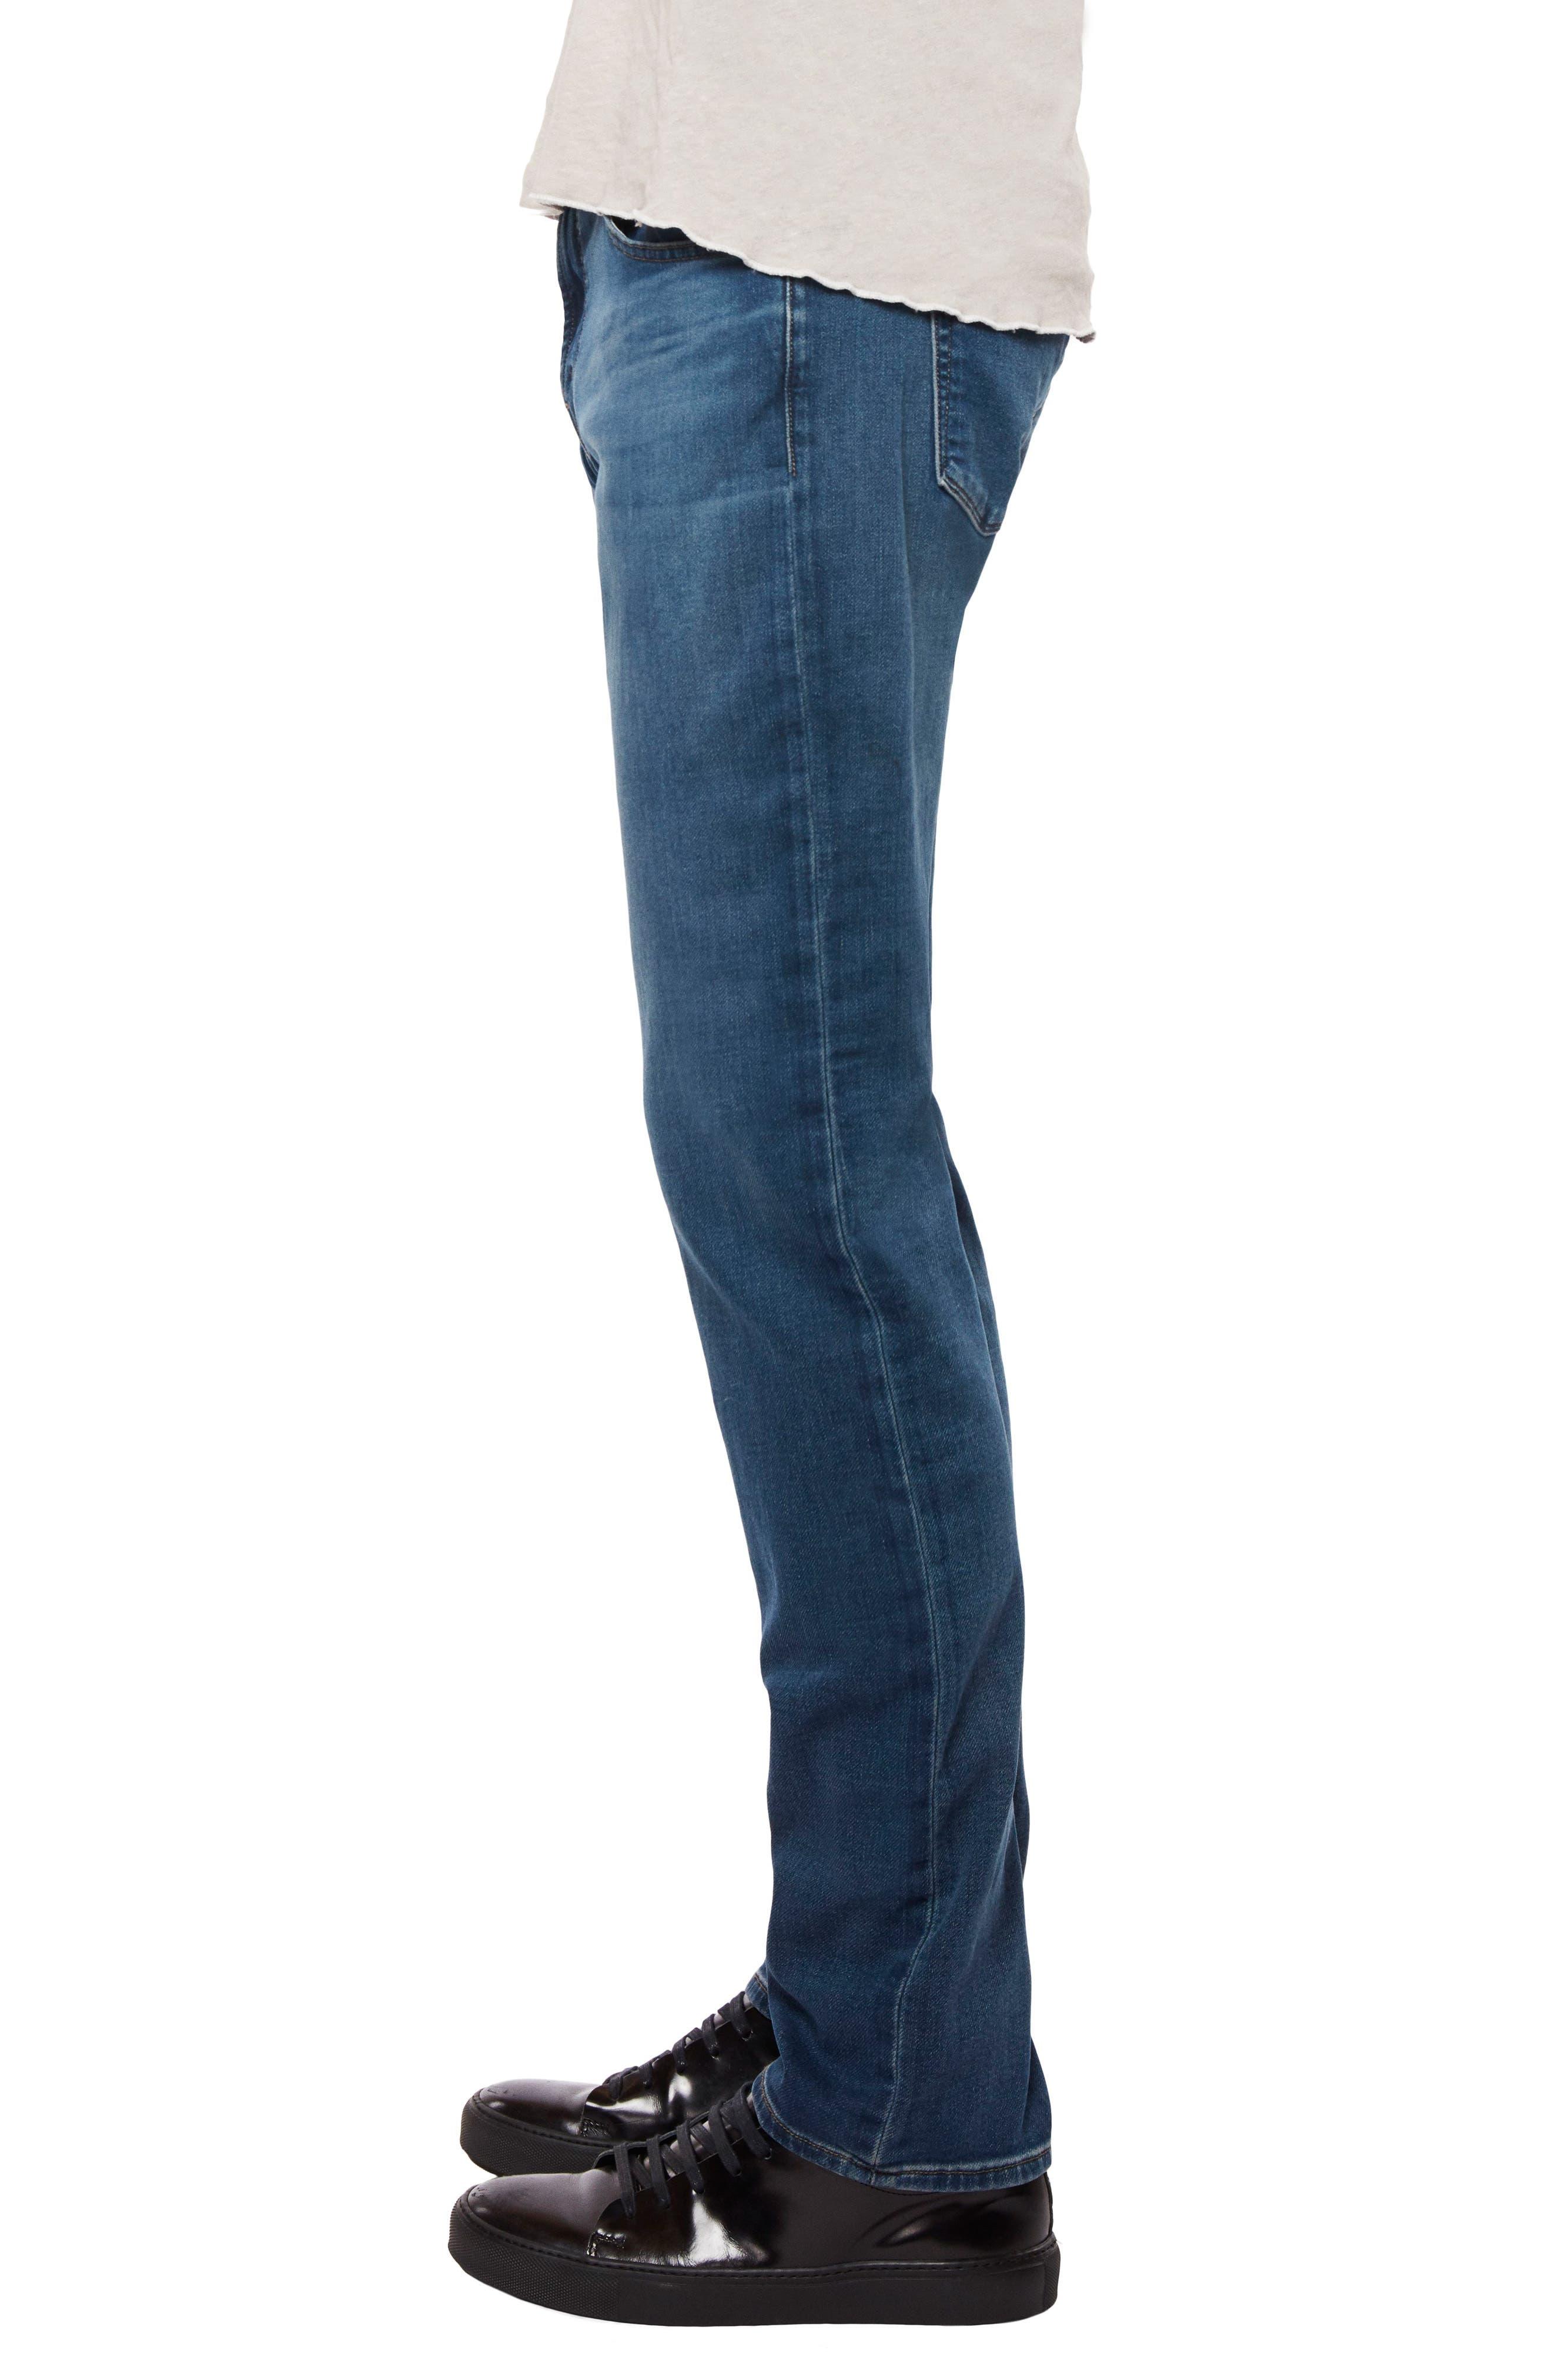 Kane Slim Straight Leg Jeans,                             Alternate thumbnail 3, color,                             Landform